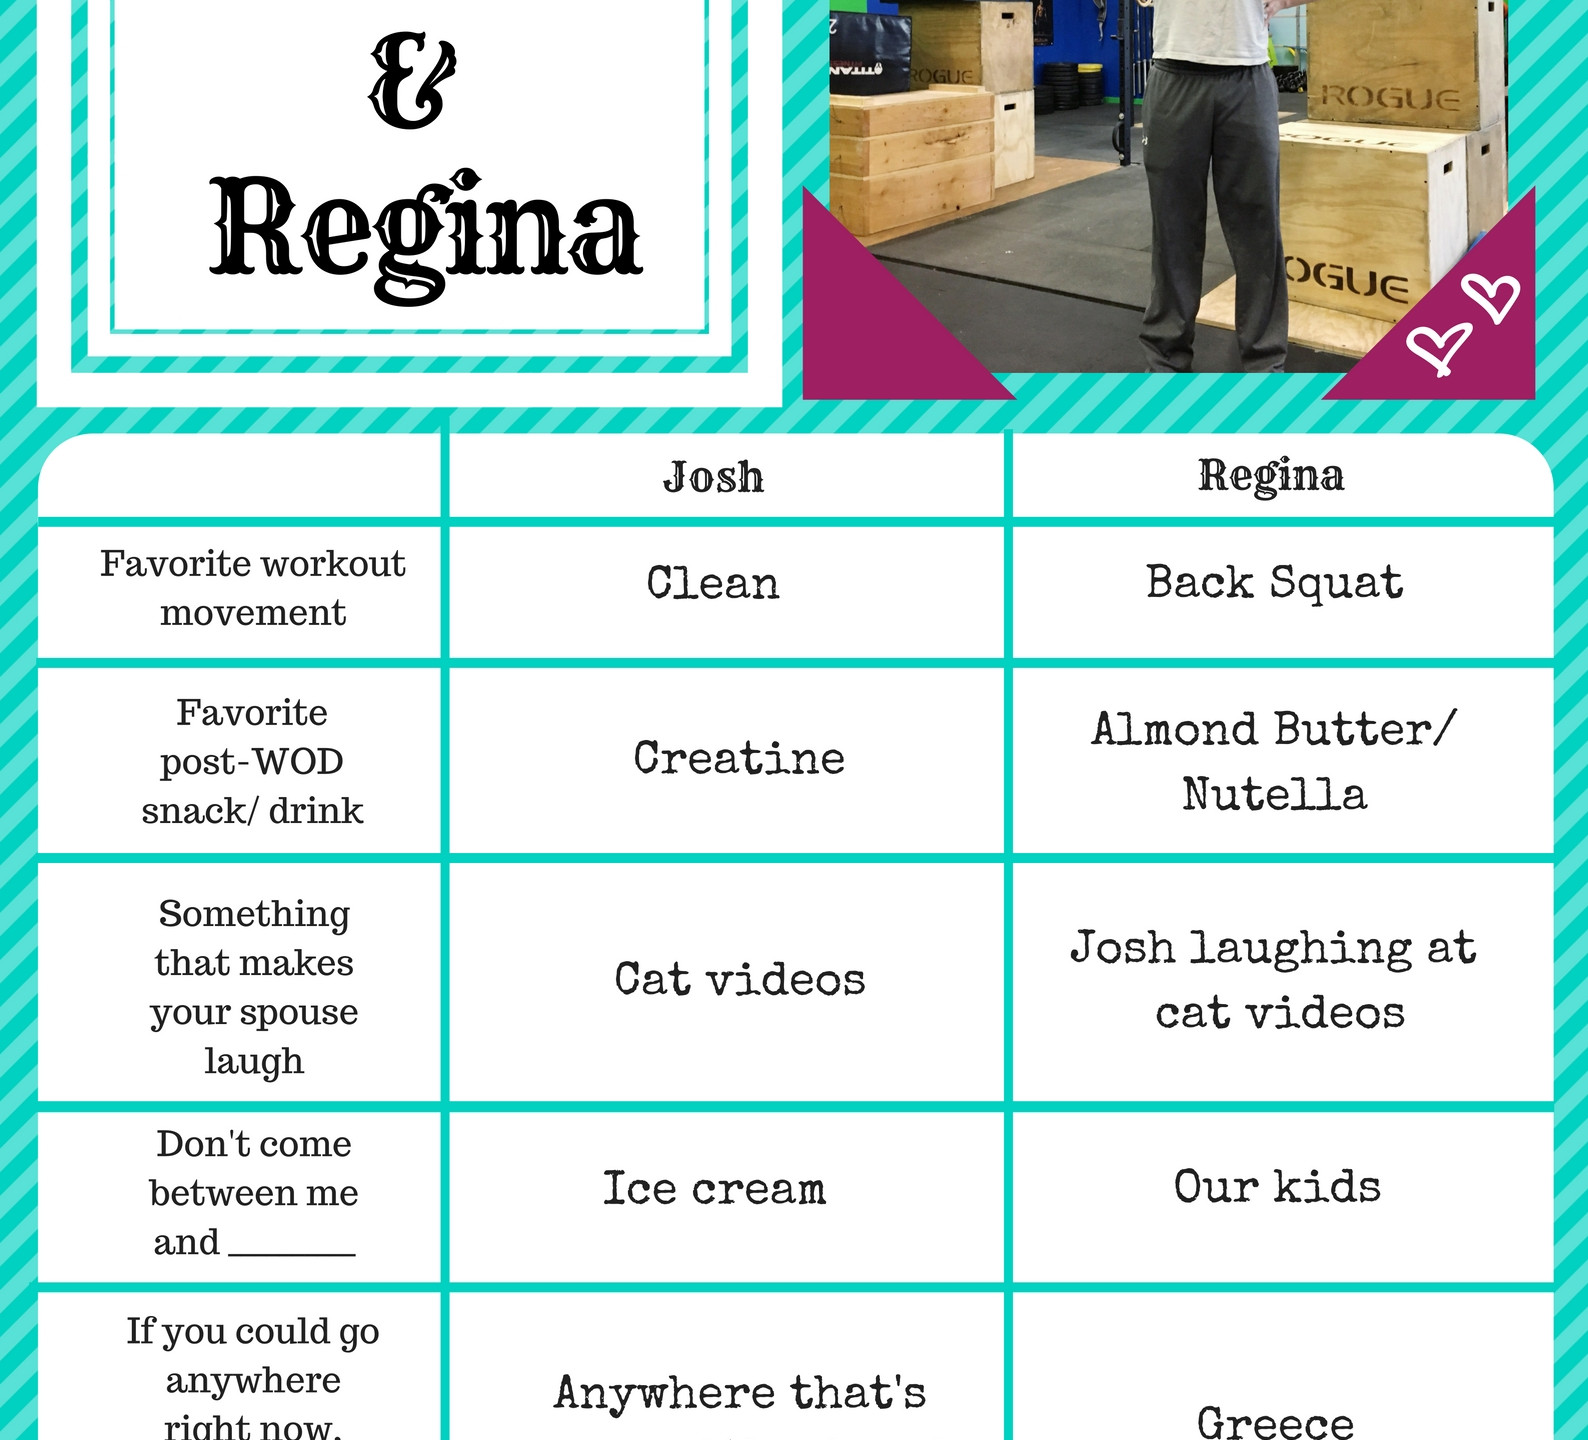 Josh and Regina